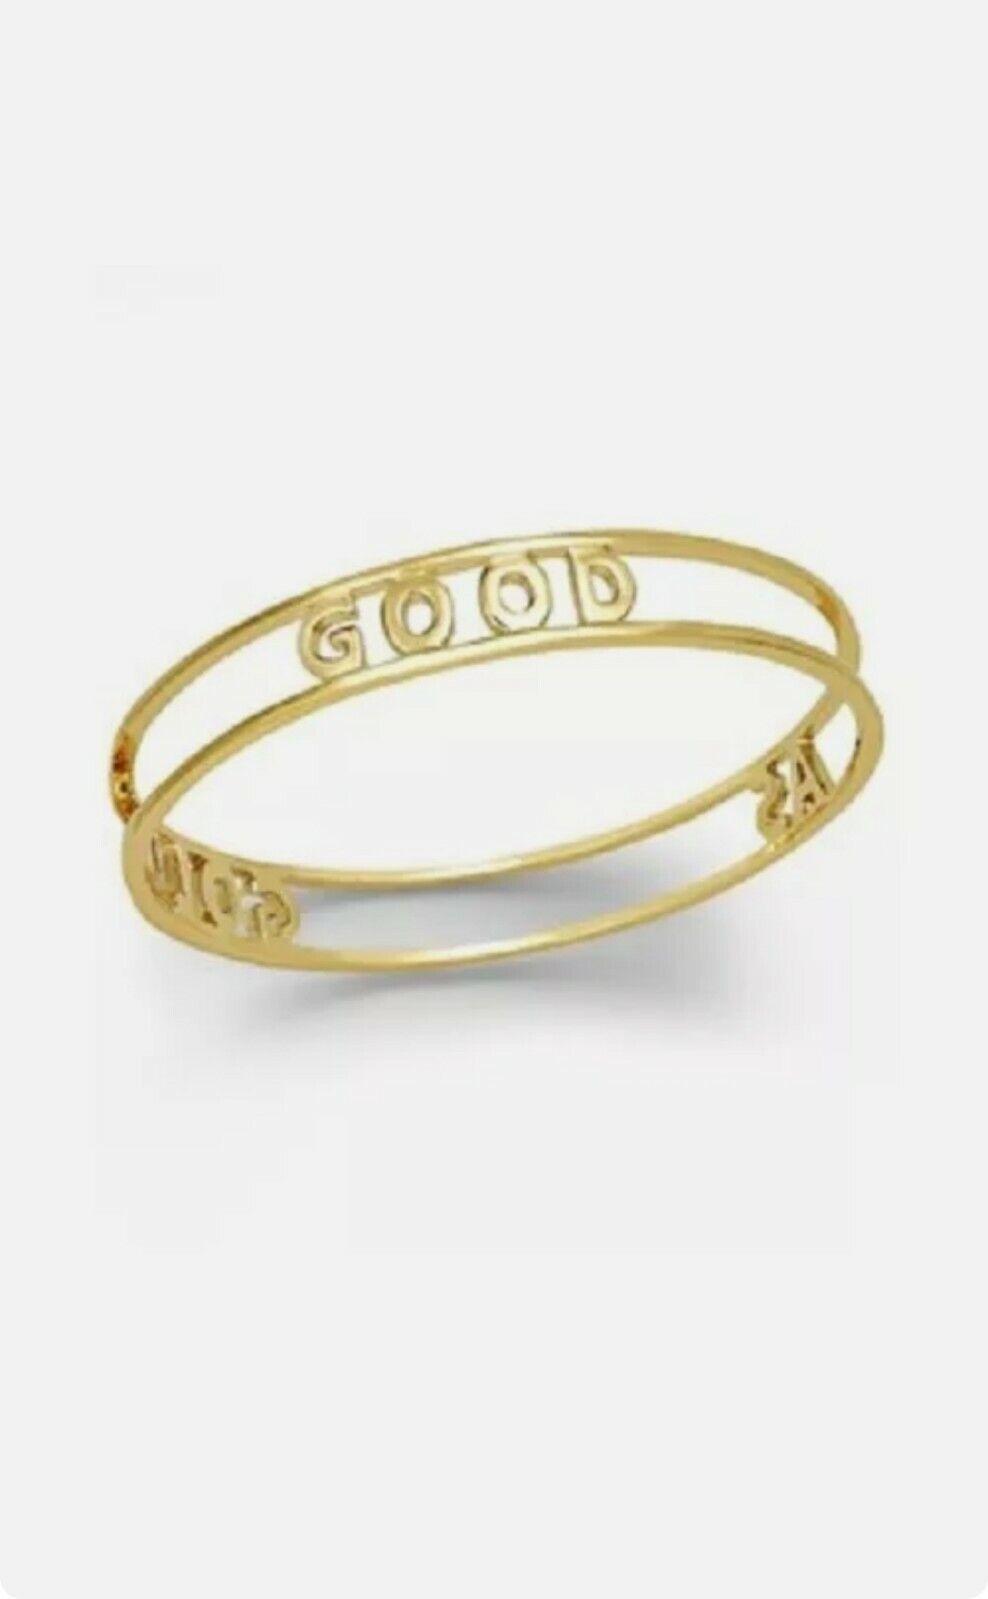 KATE SPADE 12K Gold Plated Good As Gold Bangle Bracelet WBRU8856 NEW Fab